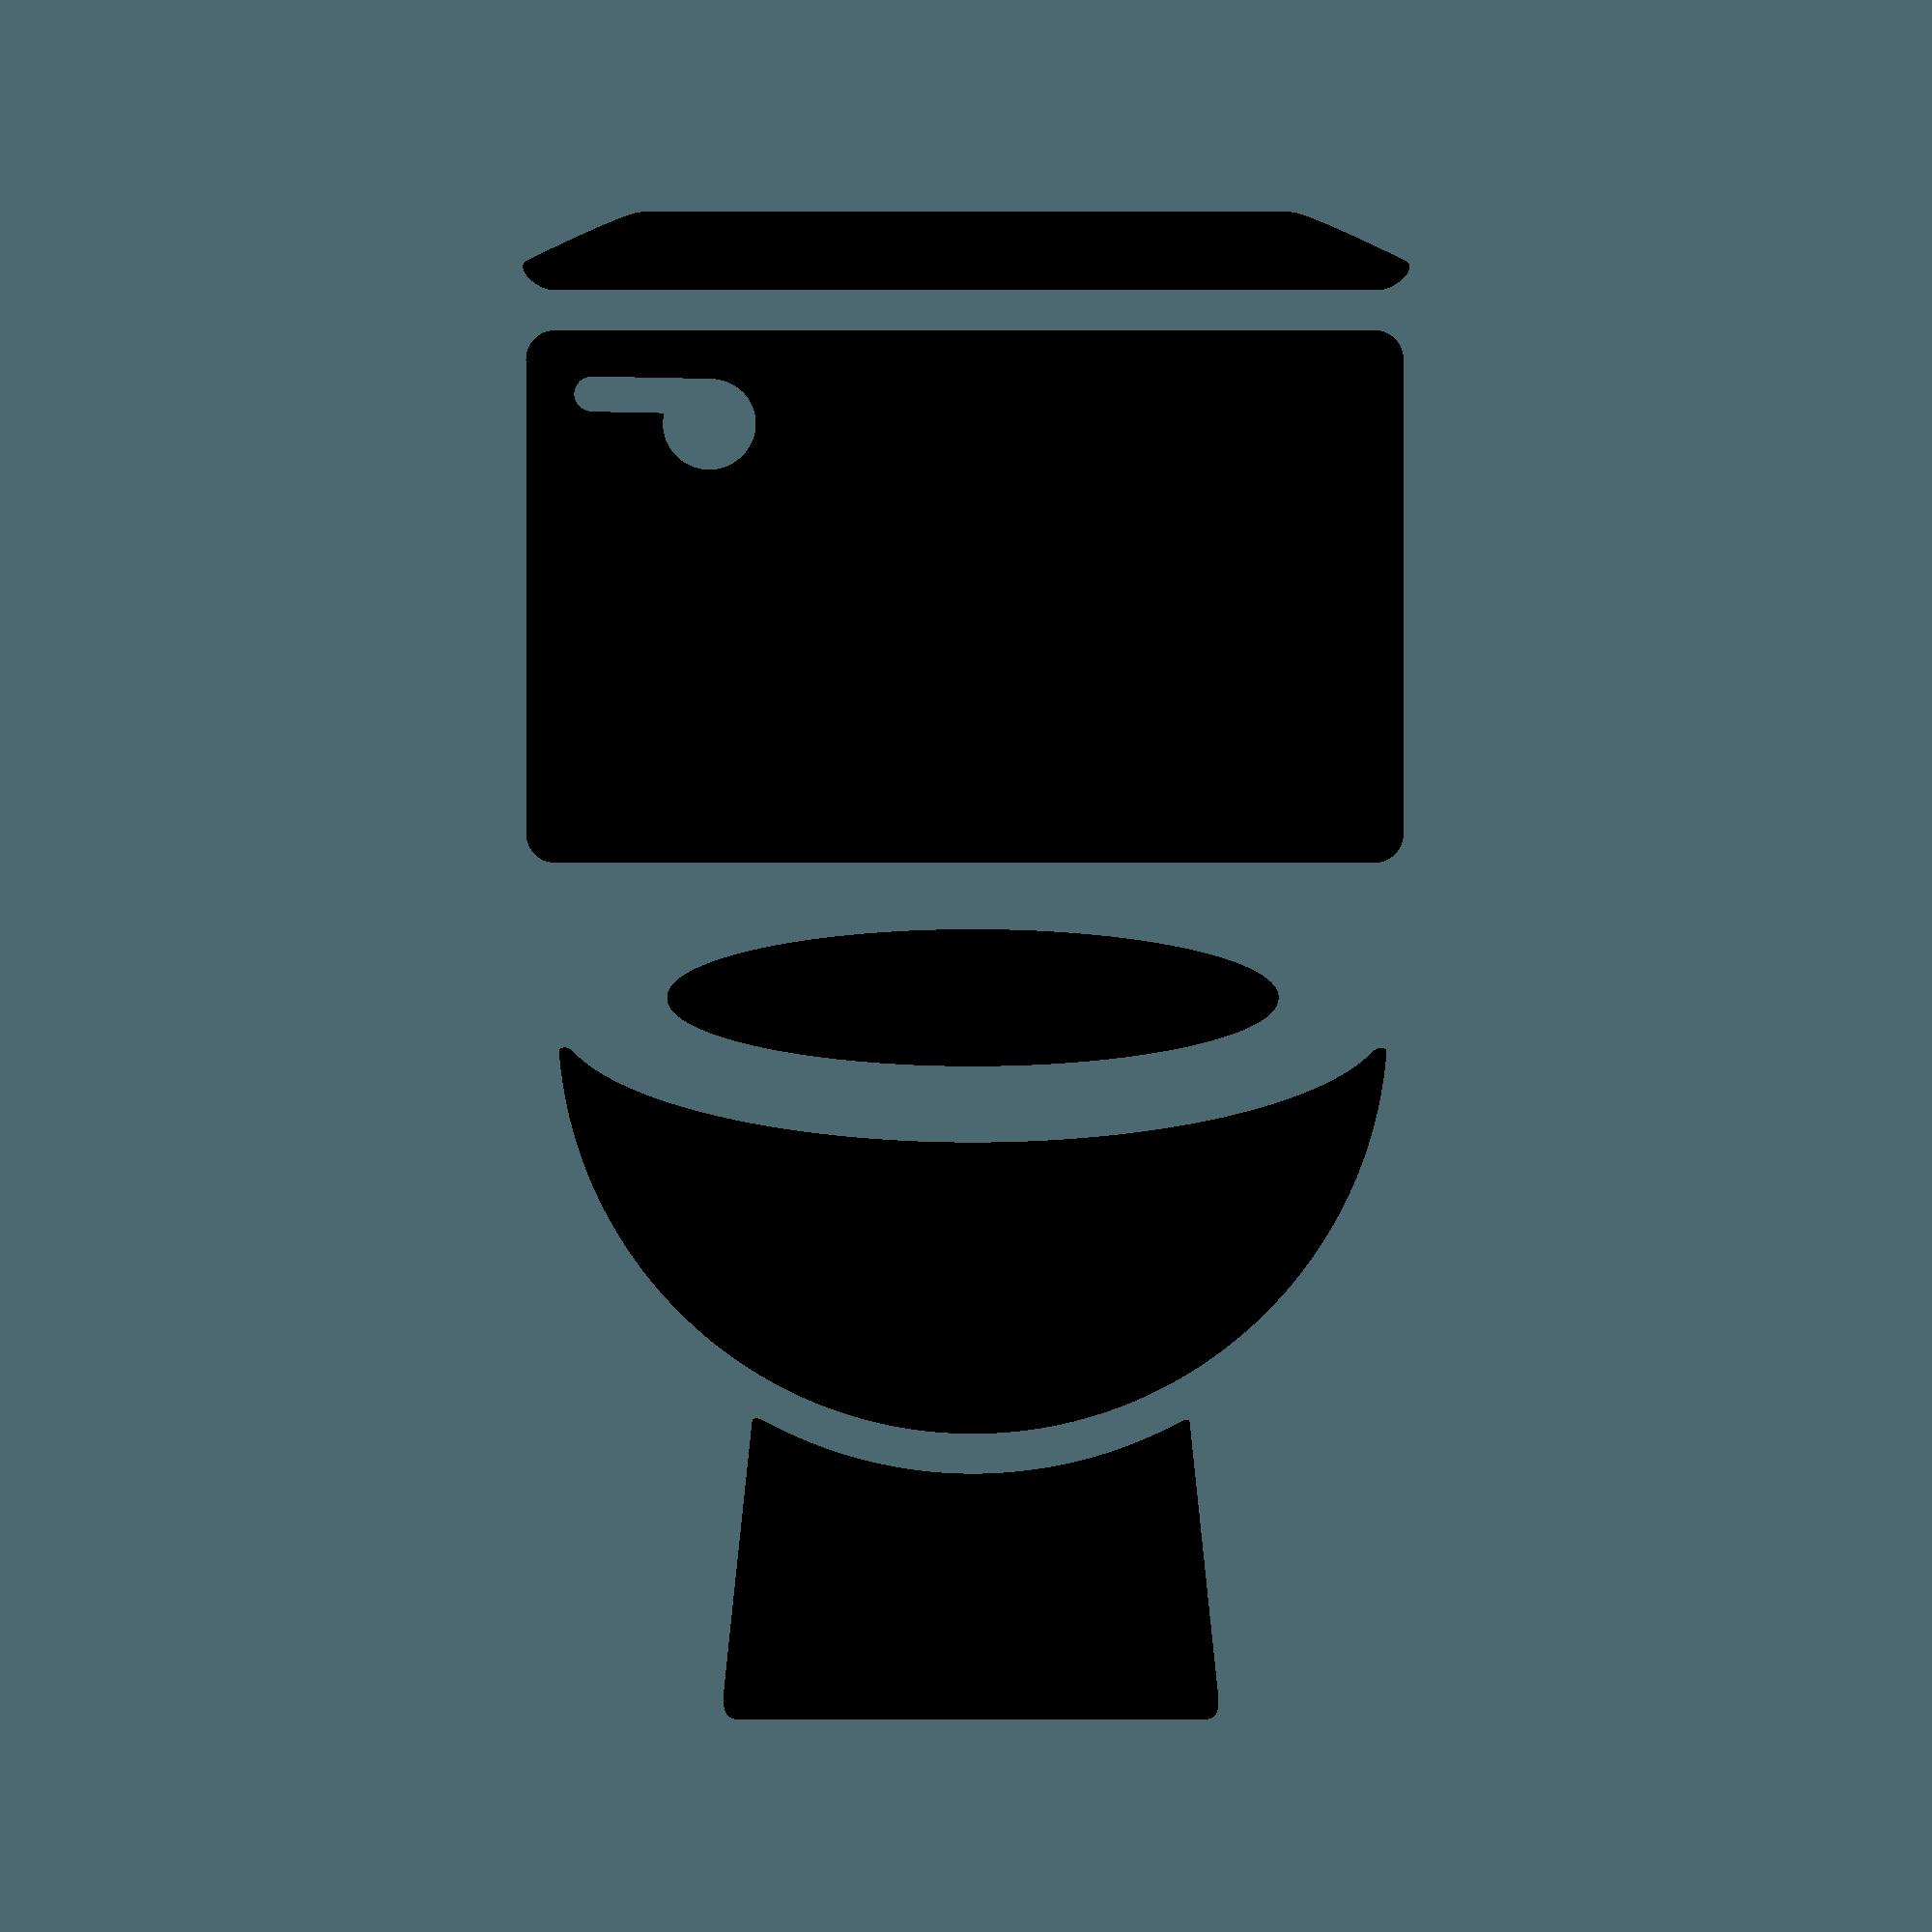 Bathroom toilet icon drain. Clean clipart clean restroom